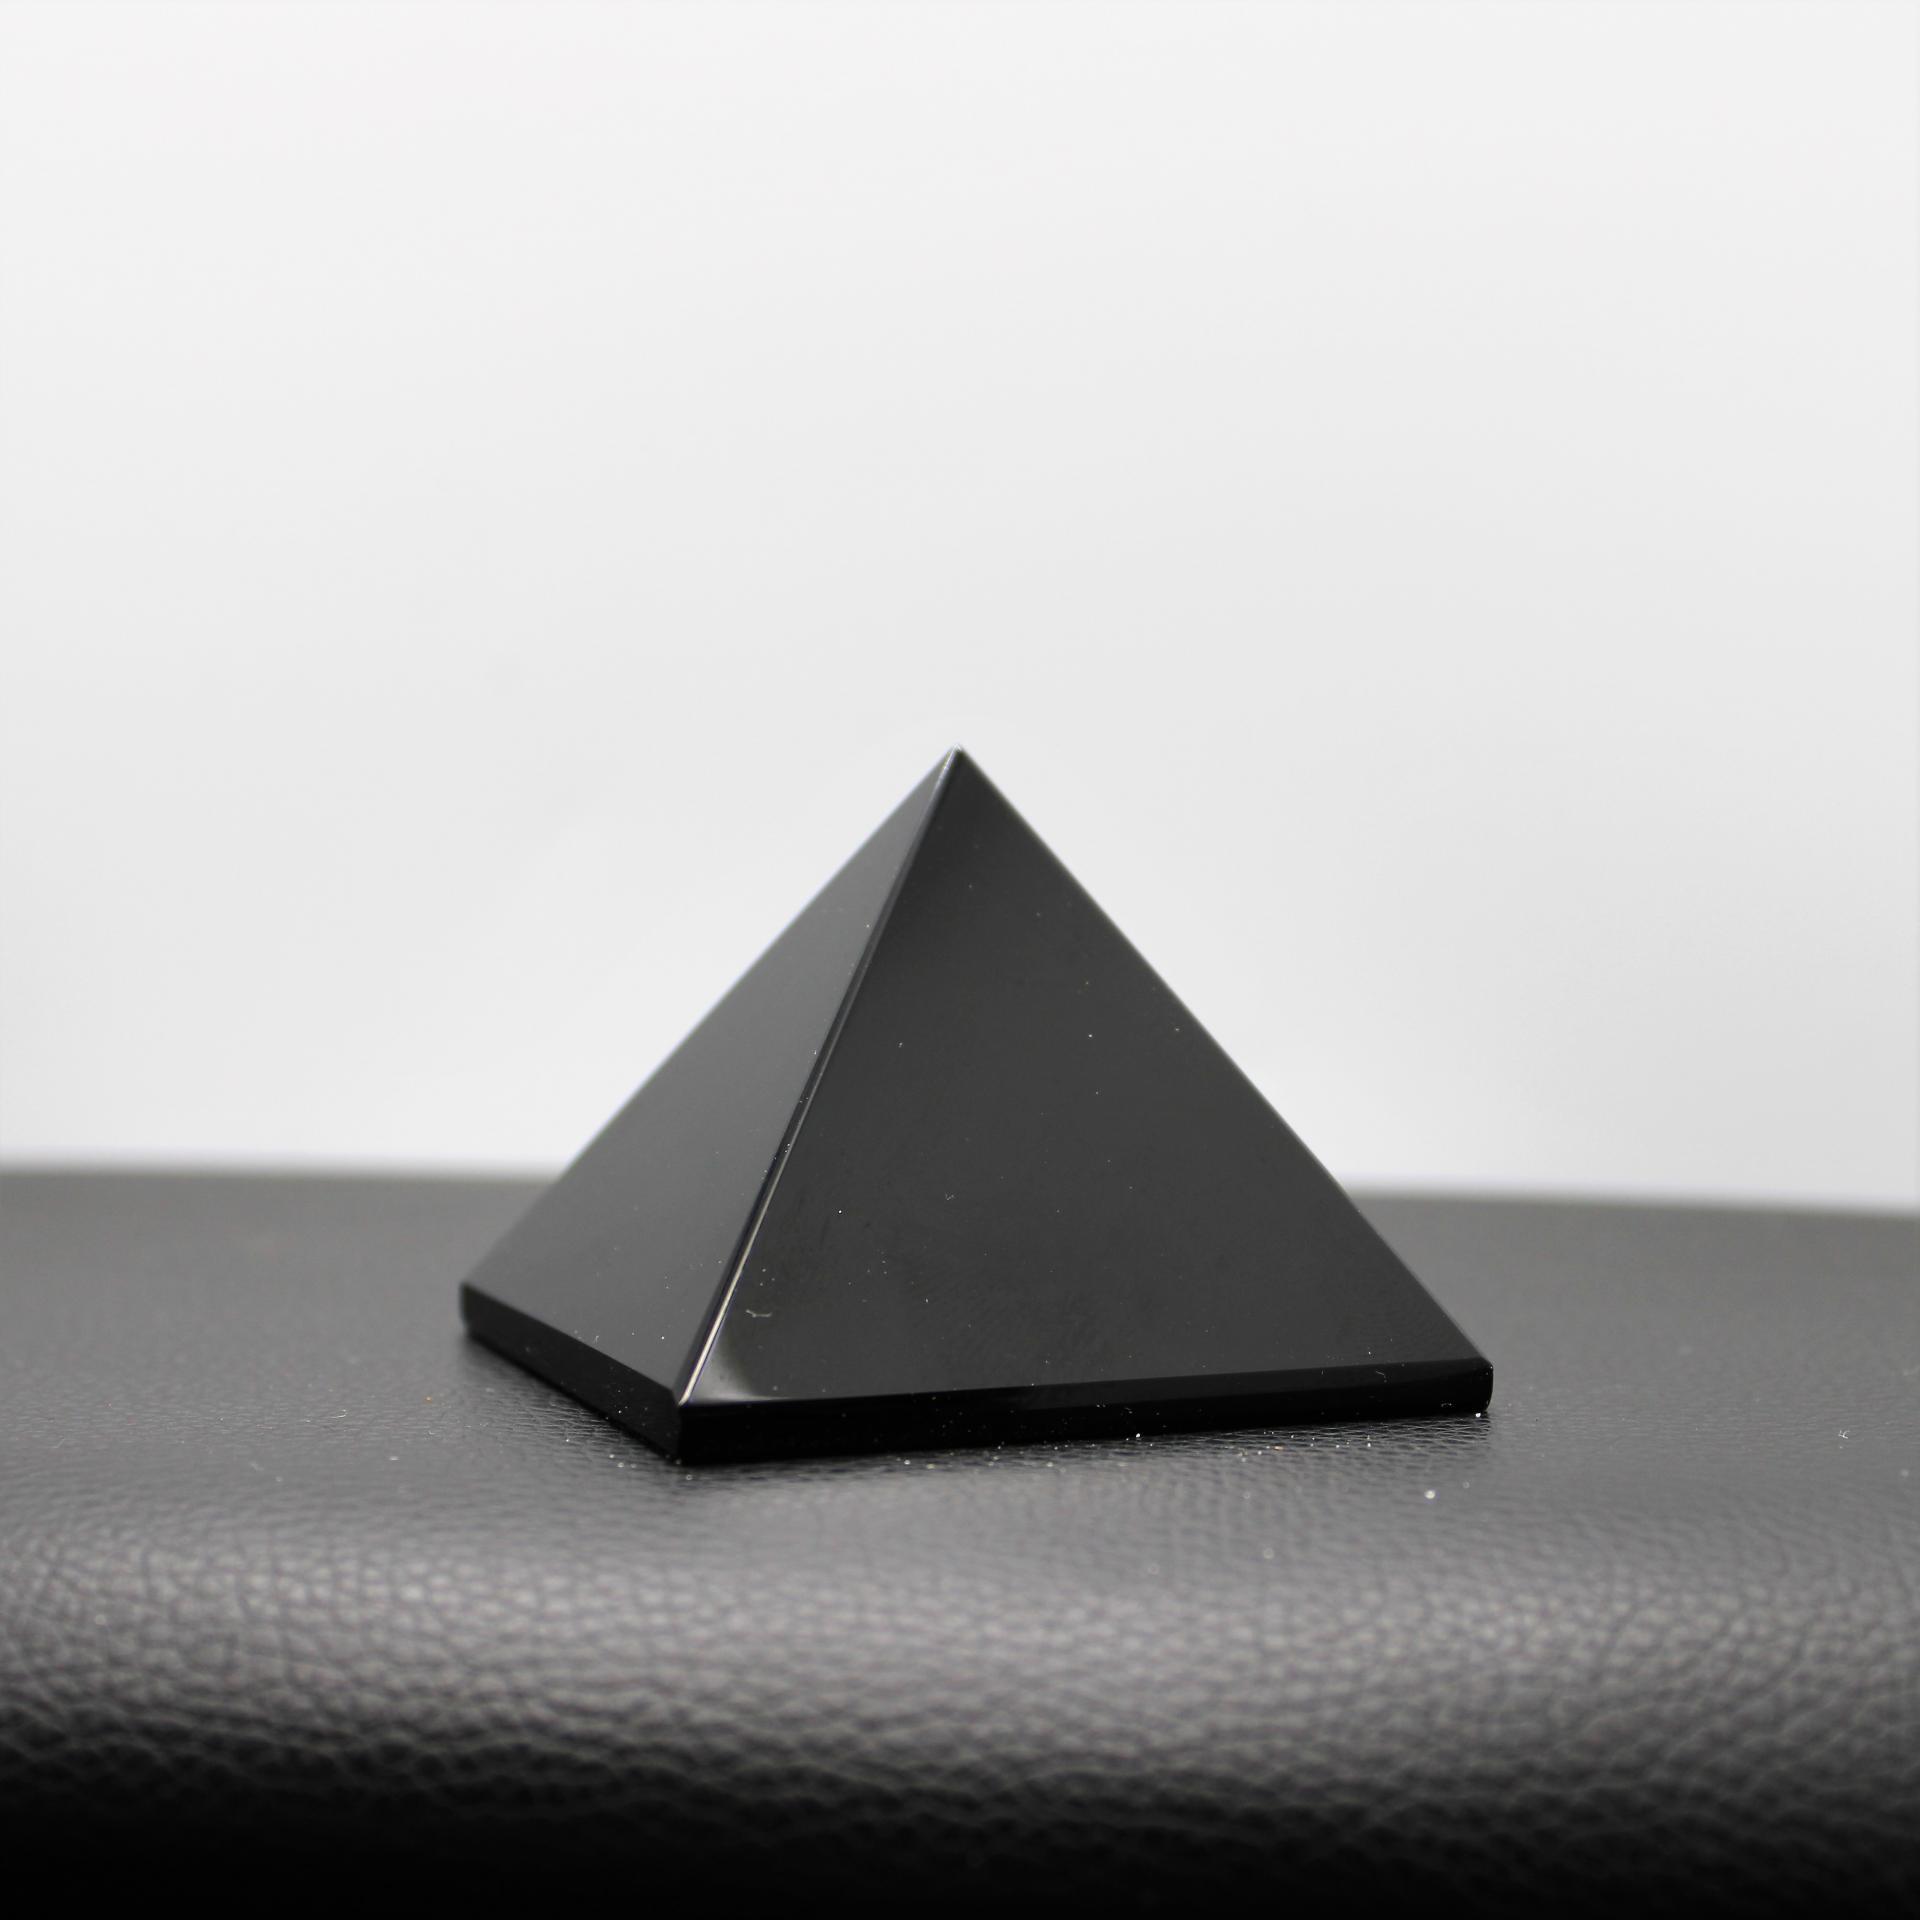 Pyramide Shungite lessenceau1000pendules 109